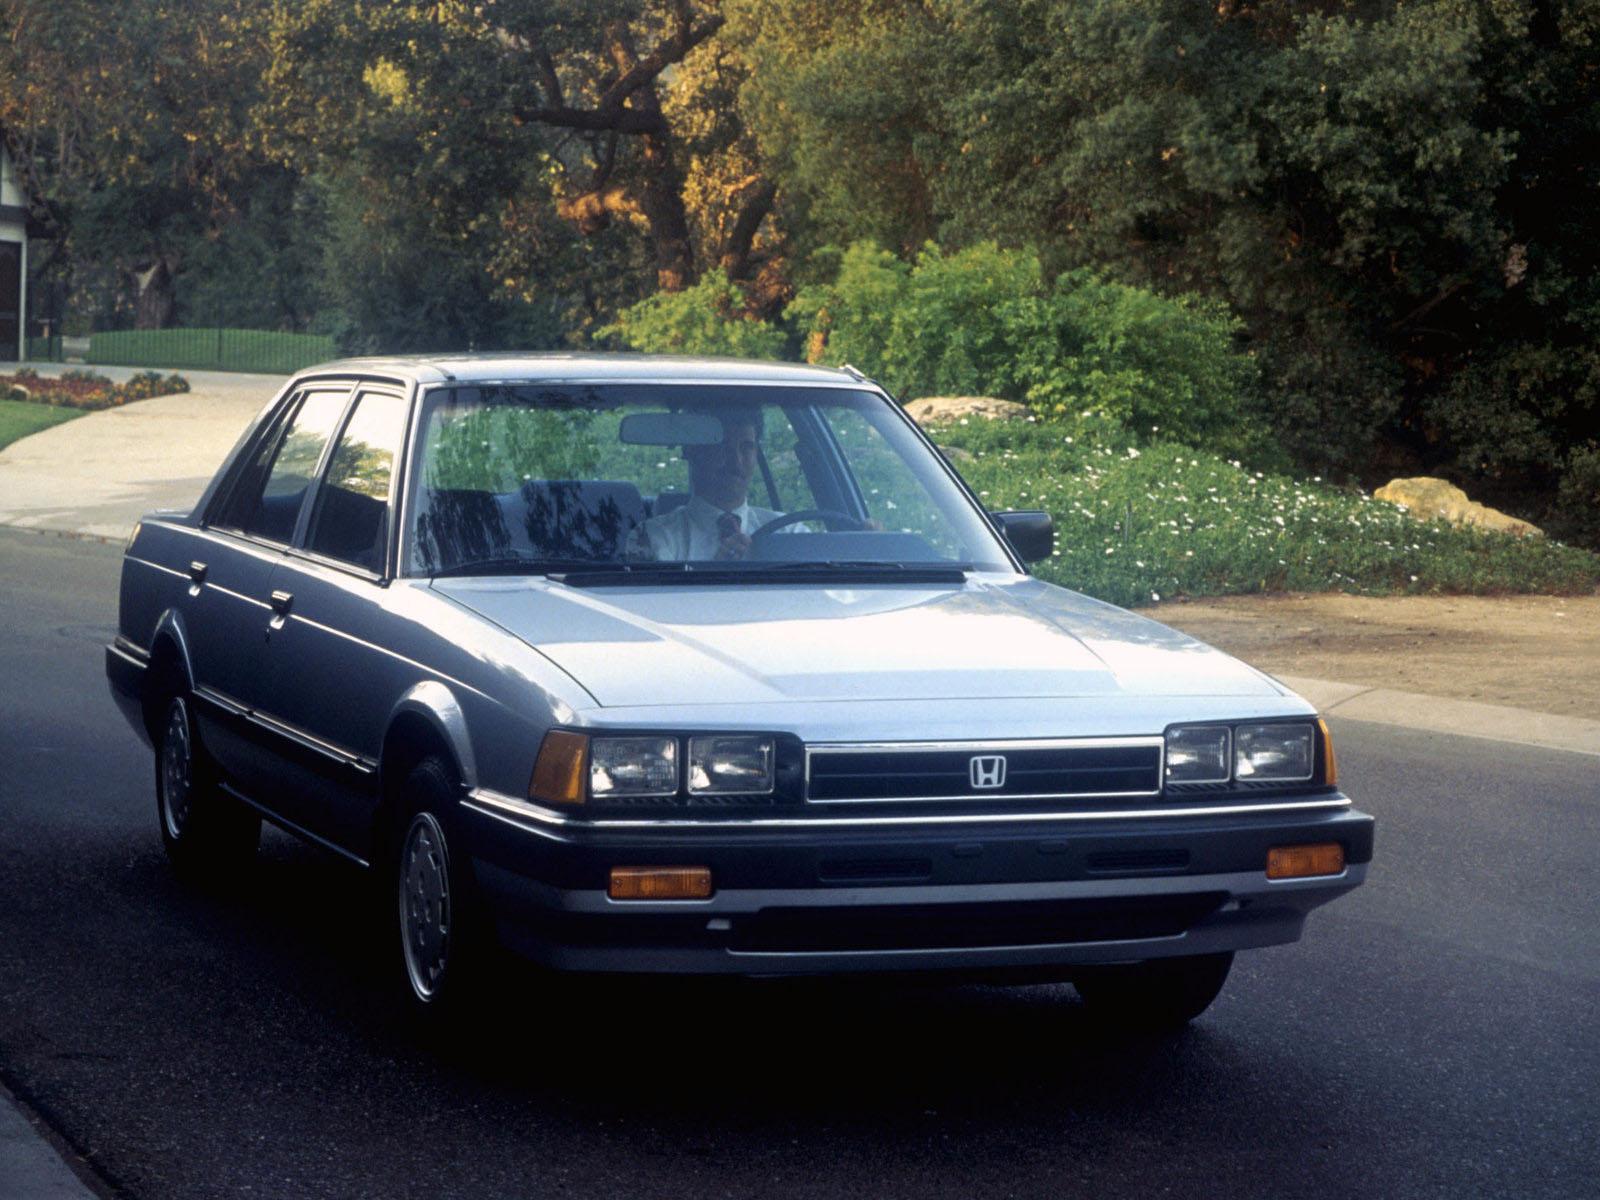 Honda Accord 4 Doors Specs Amp Photos 1981 1982 1983